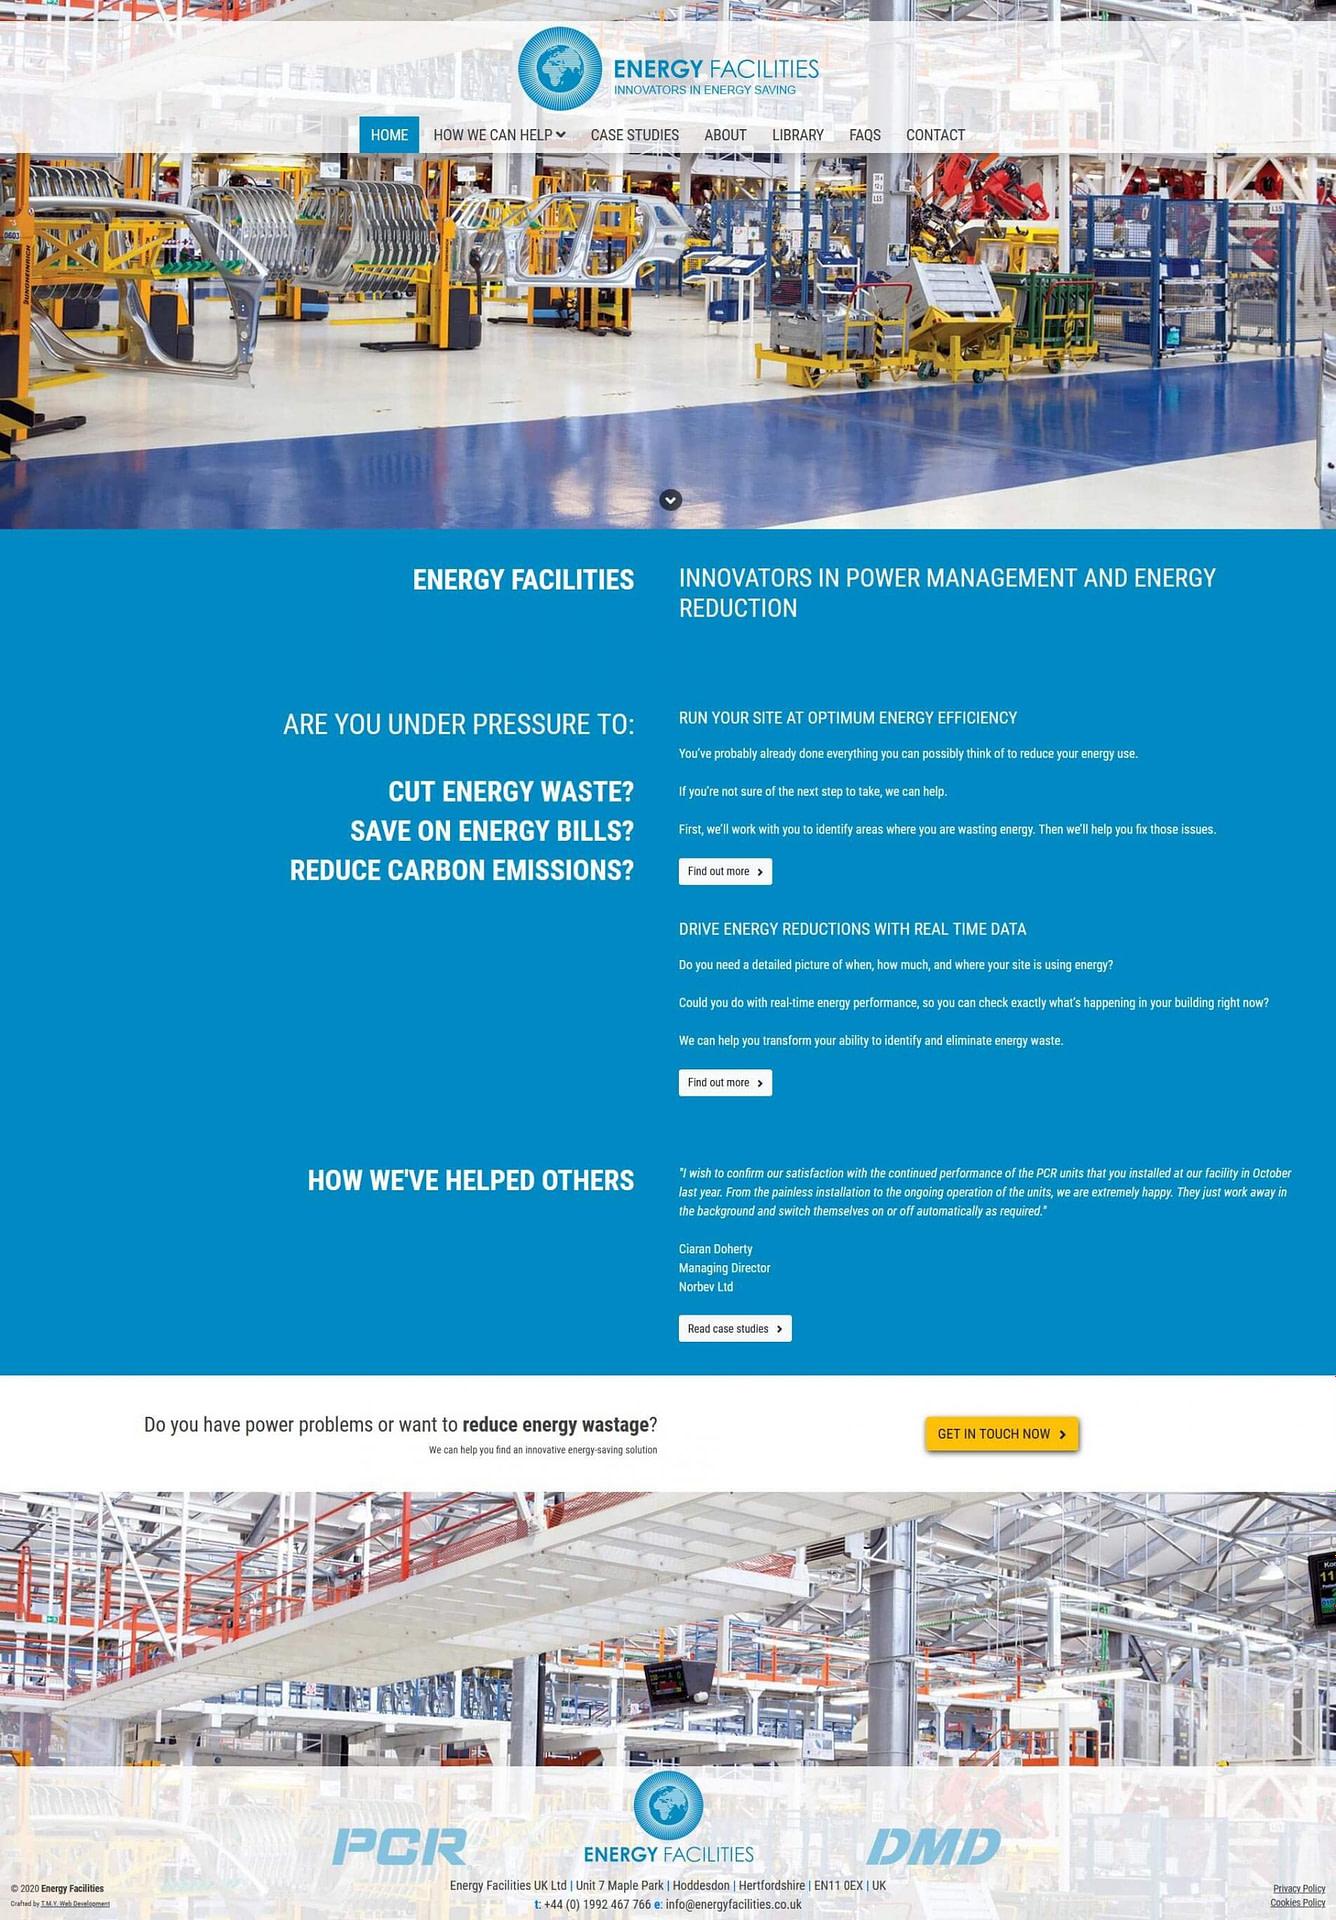 Energy Facilities - Too Mnay Years Web Development